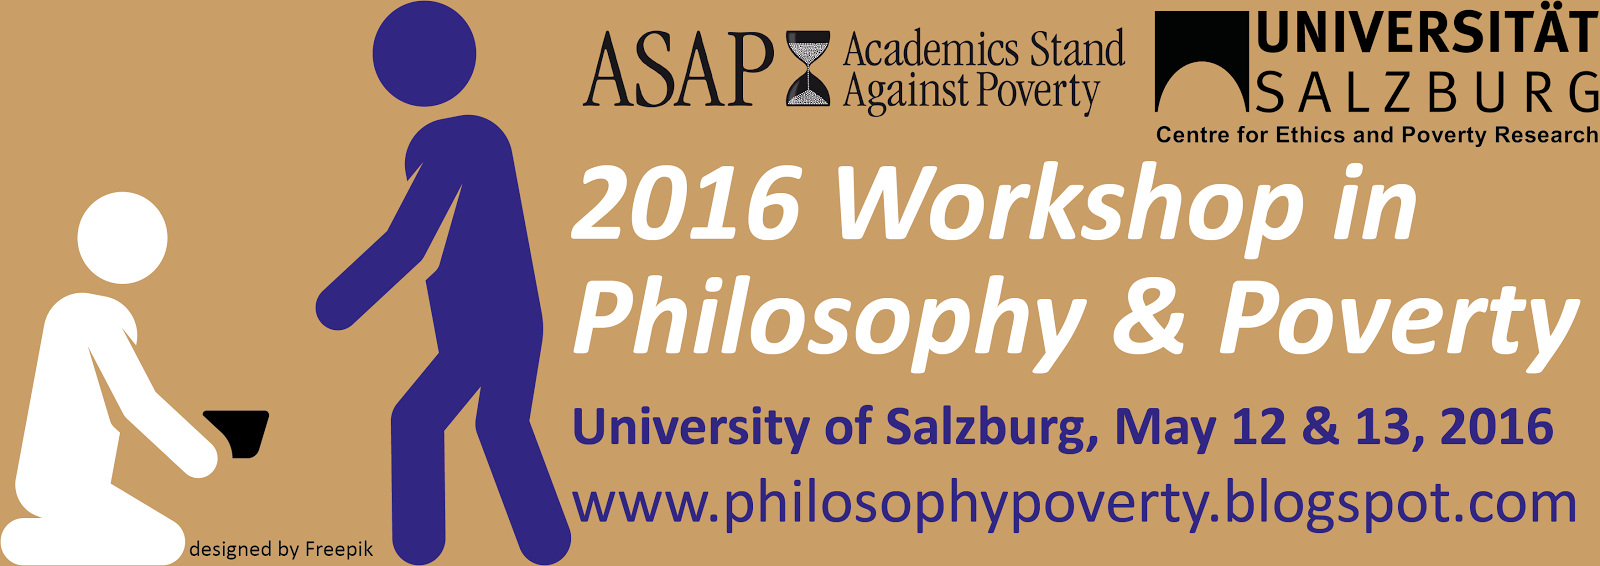 Workshop in Philosophy & Poverty